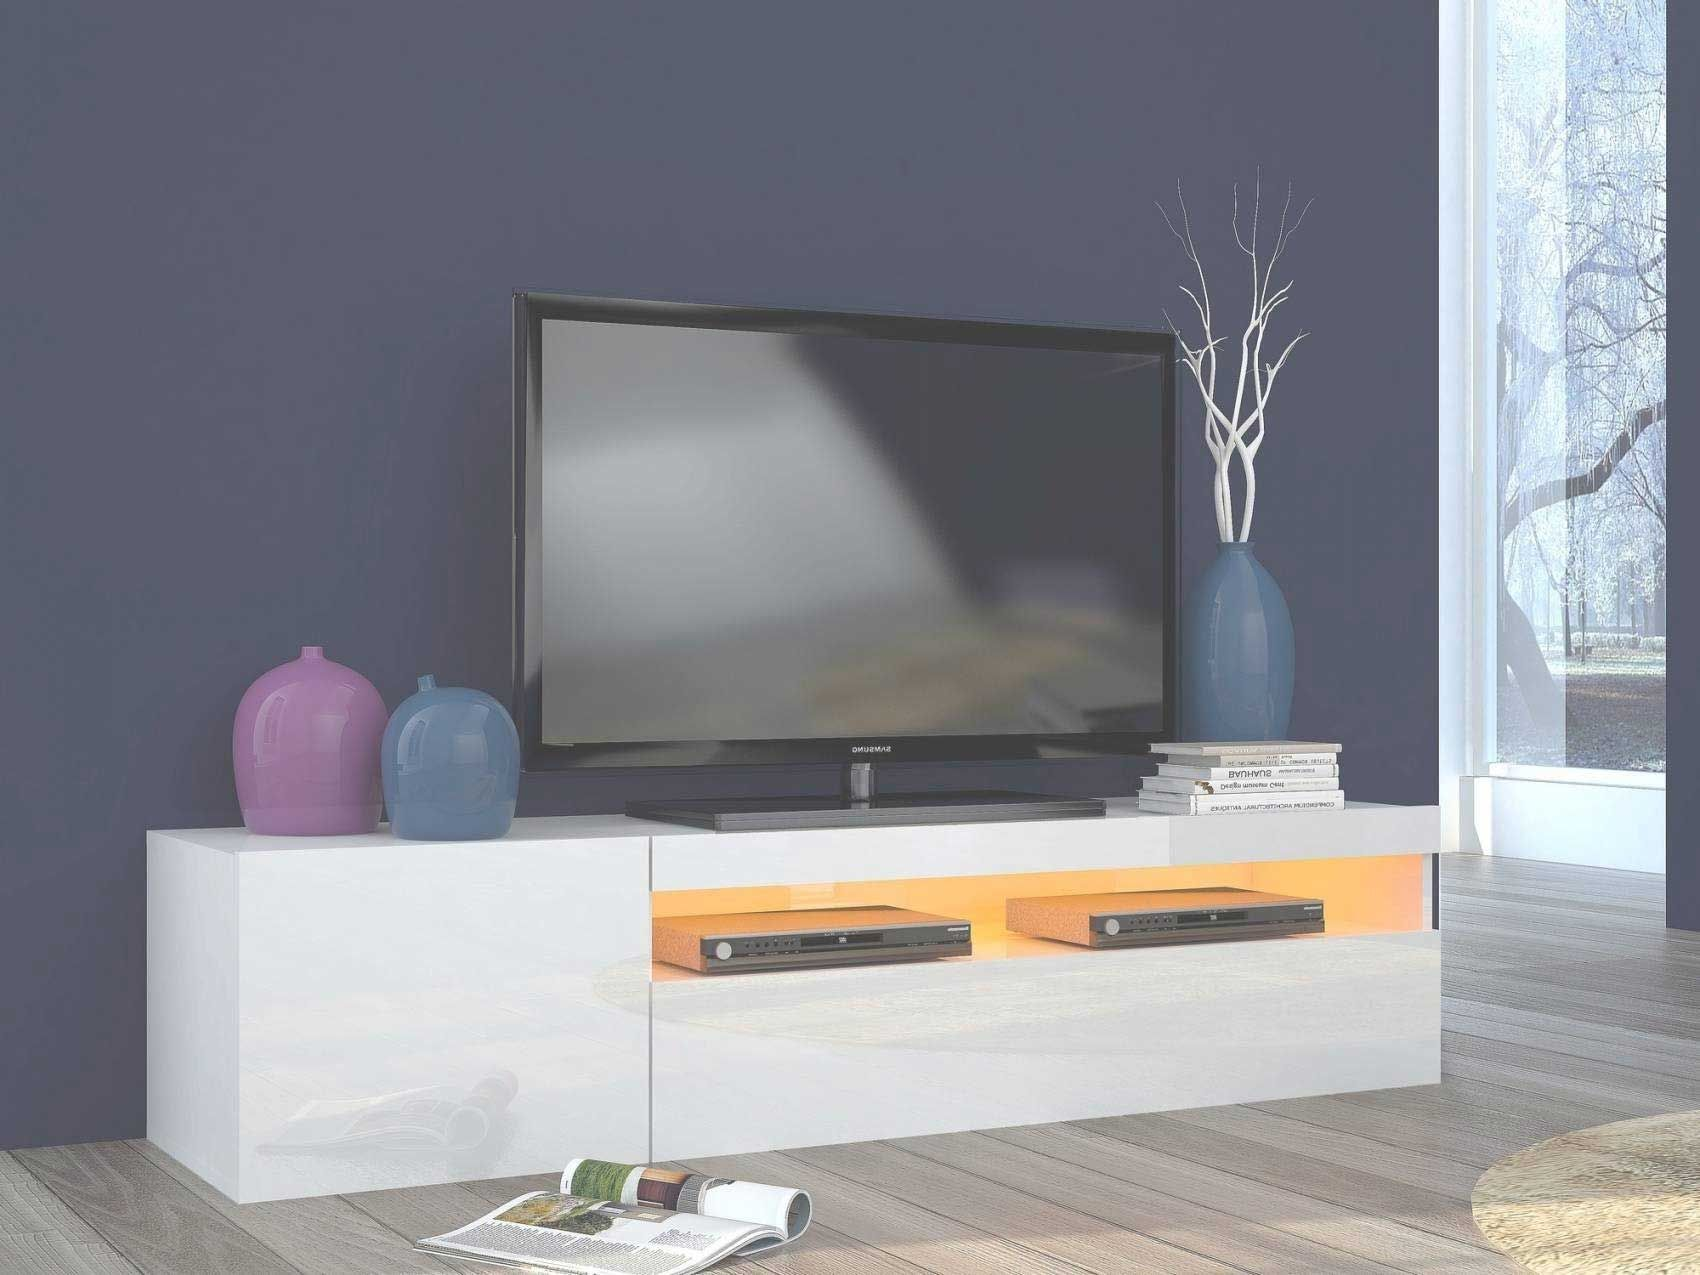 Meuble Tv Table Basse Assorti meuble tv table basse assorti meuble tv et table de salon